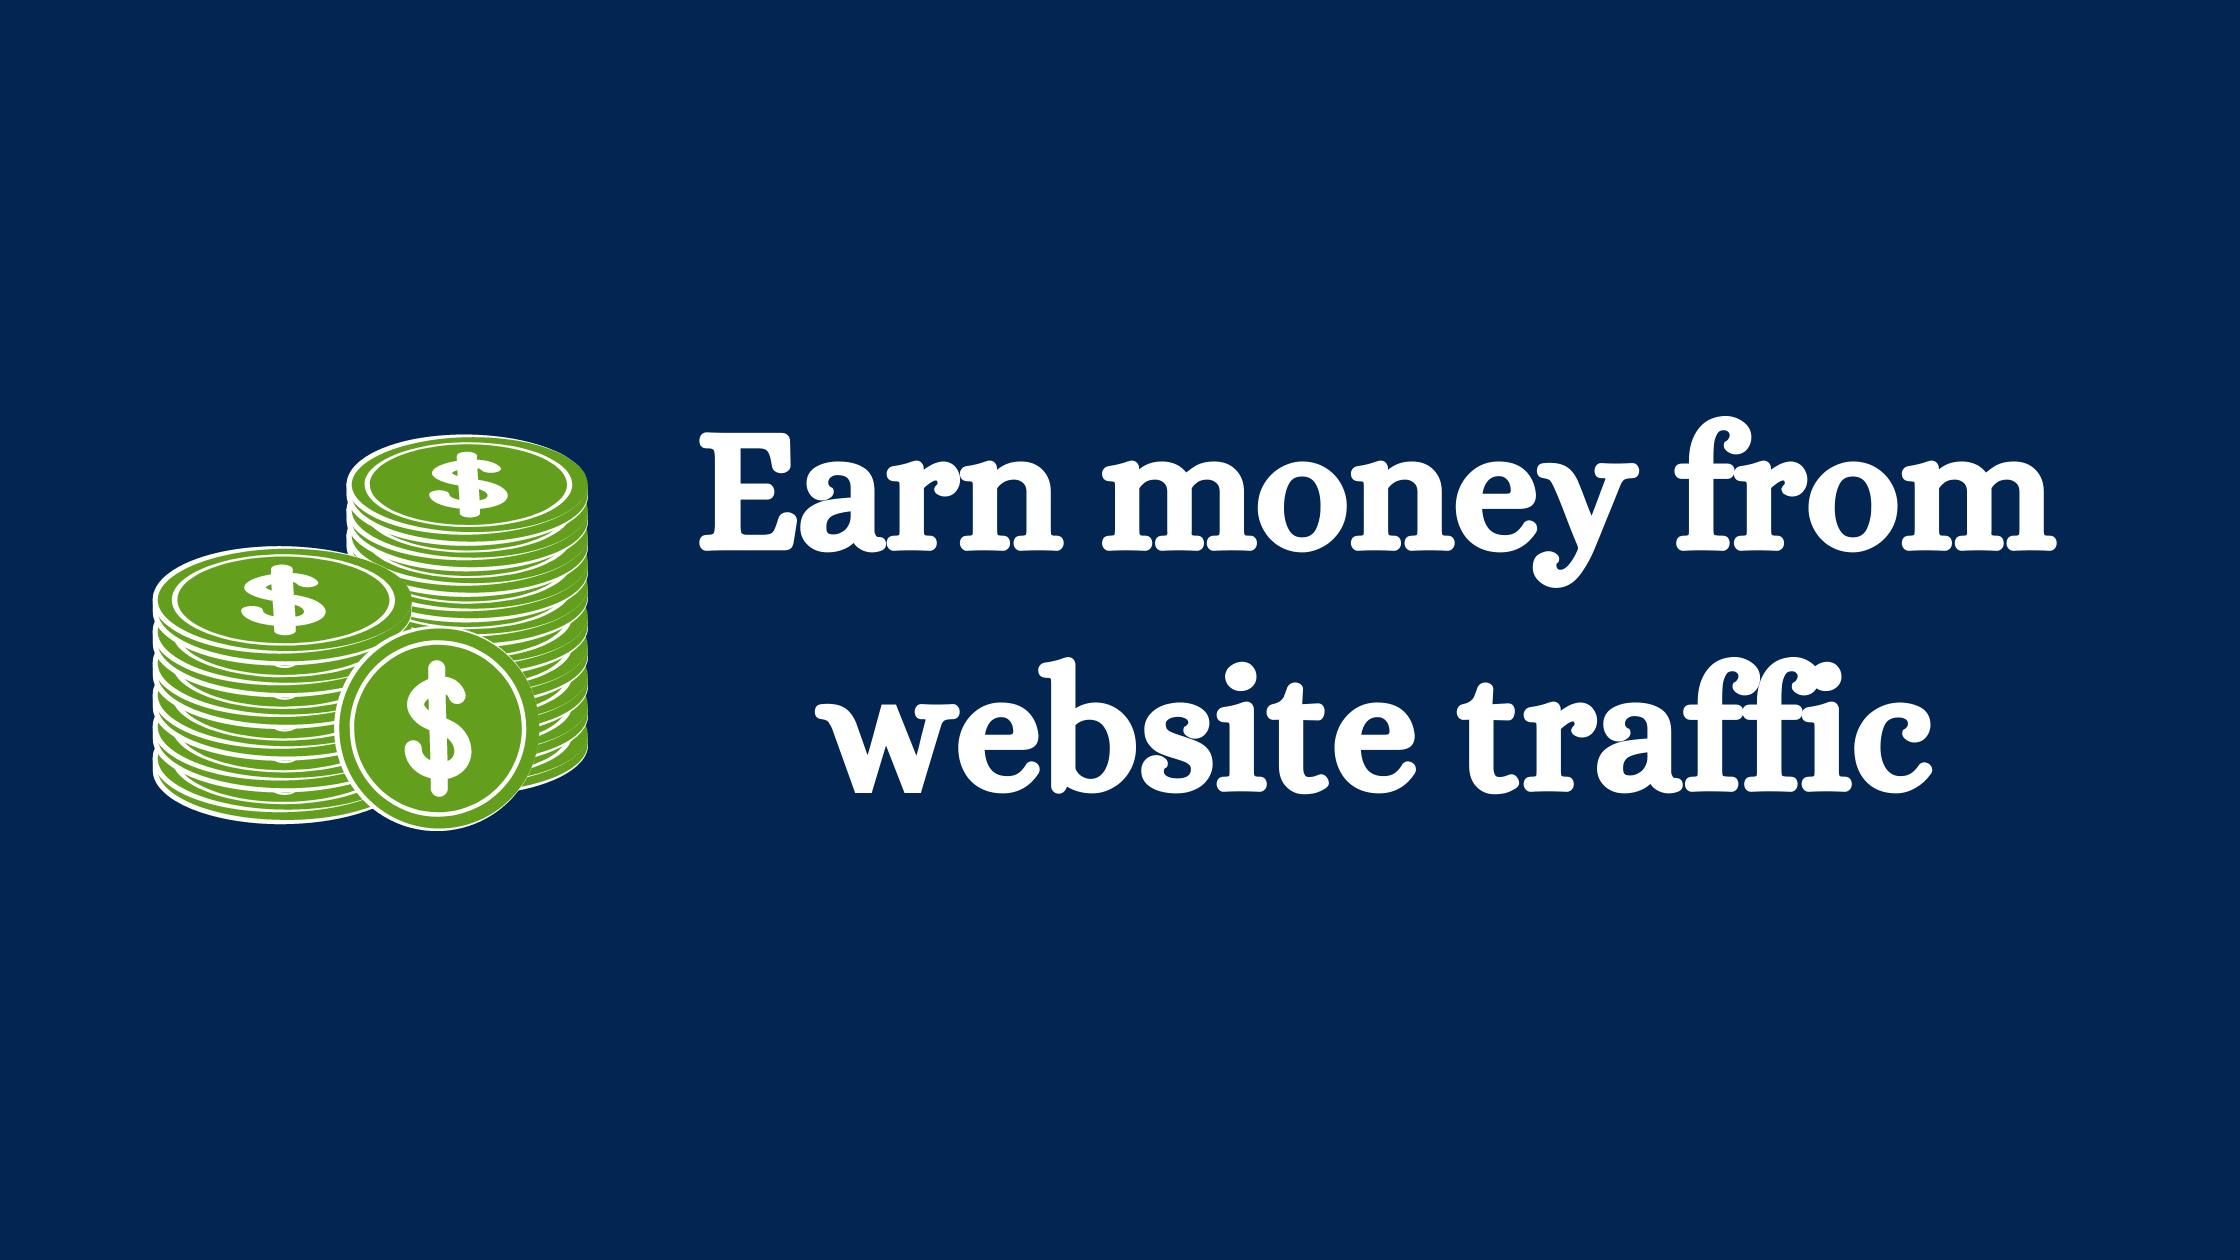 Make money from website traffic